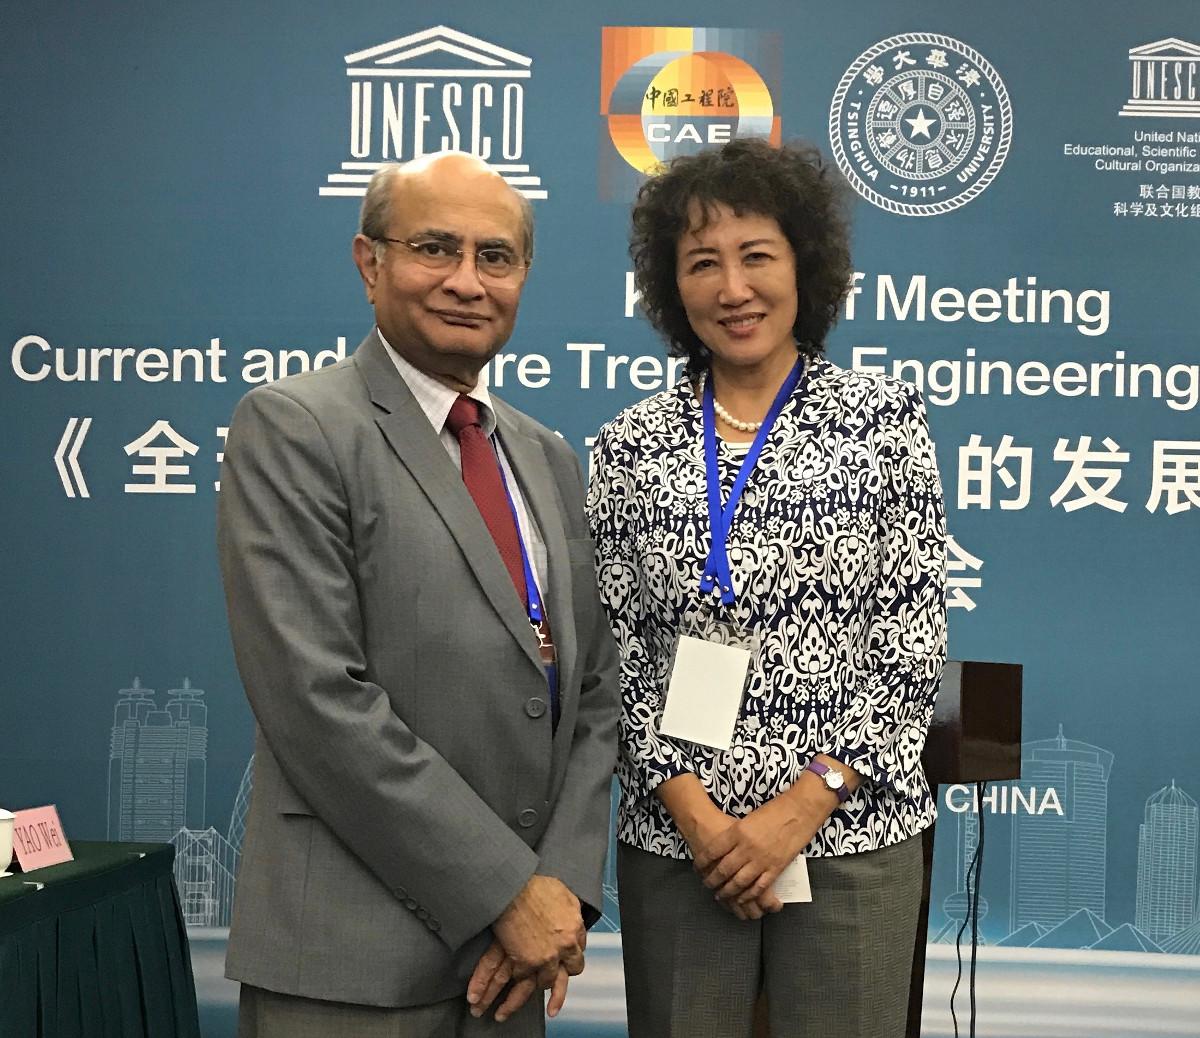 Tariq Durrani, member of the ERII Advisory Board, and Ruomei Li, Member of WFEO Executive Council